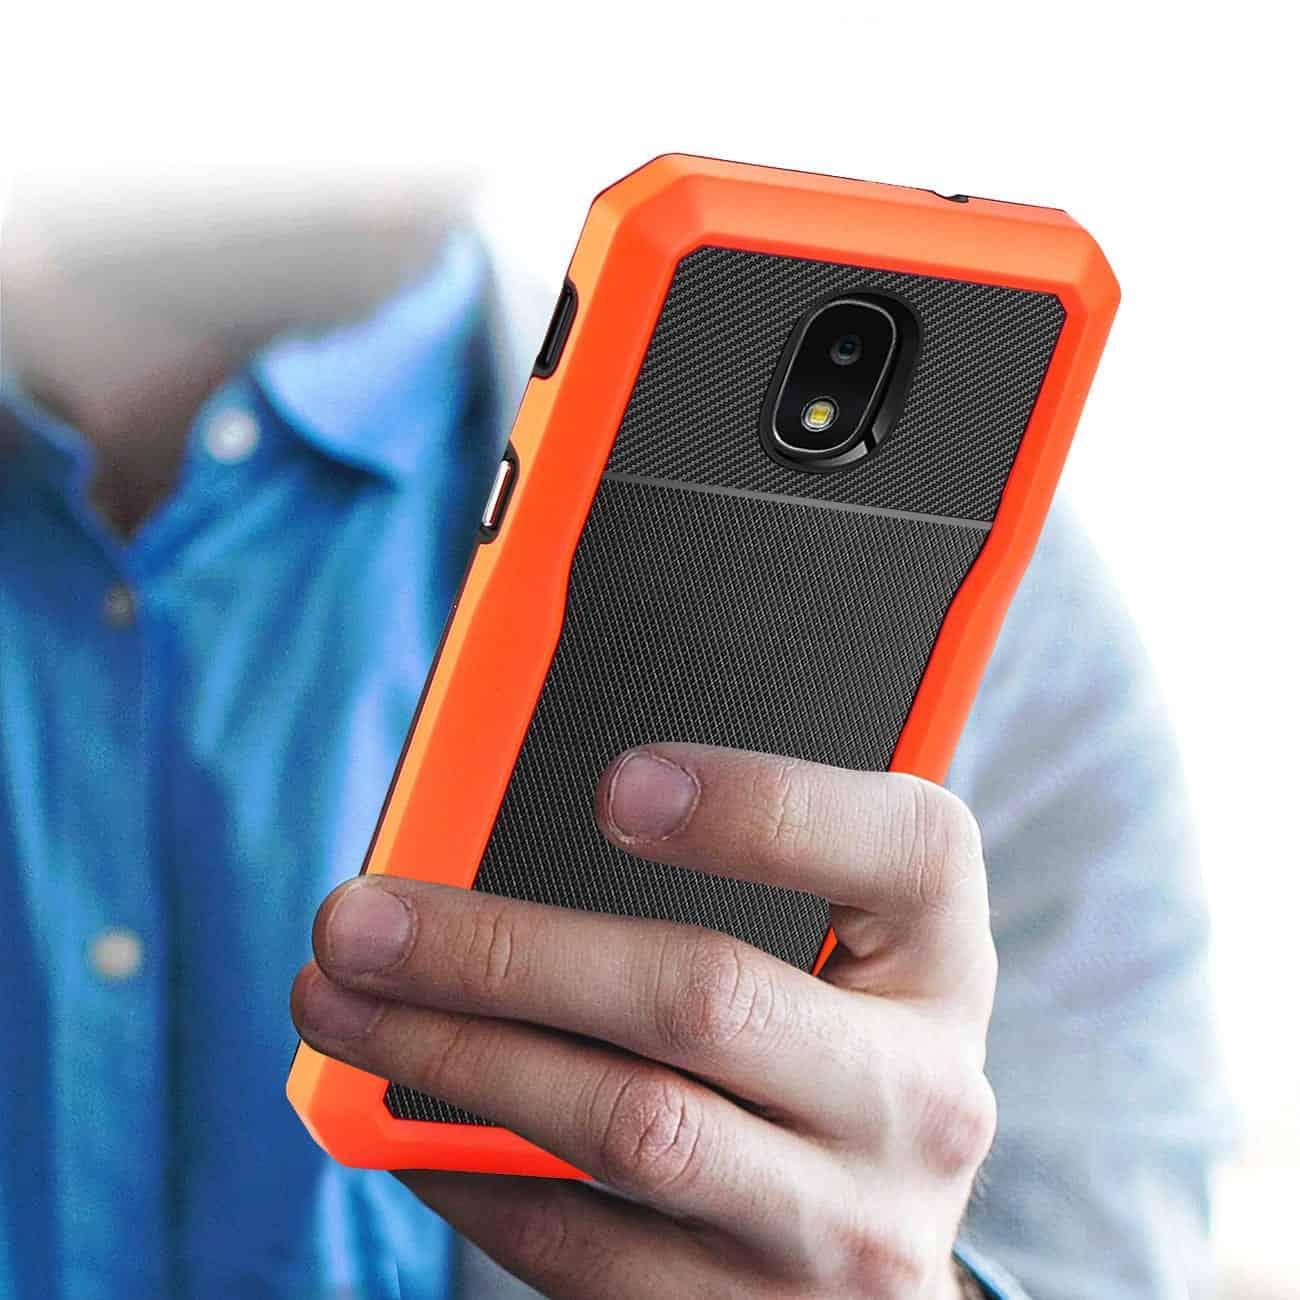 SAMSUNG GALAXY J7 (2018) Full Coverage Shockproof Case In Orange